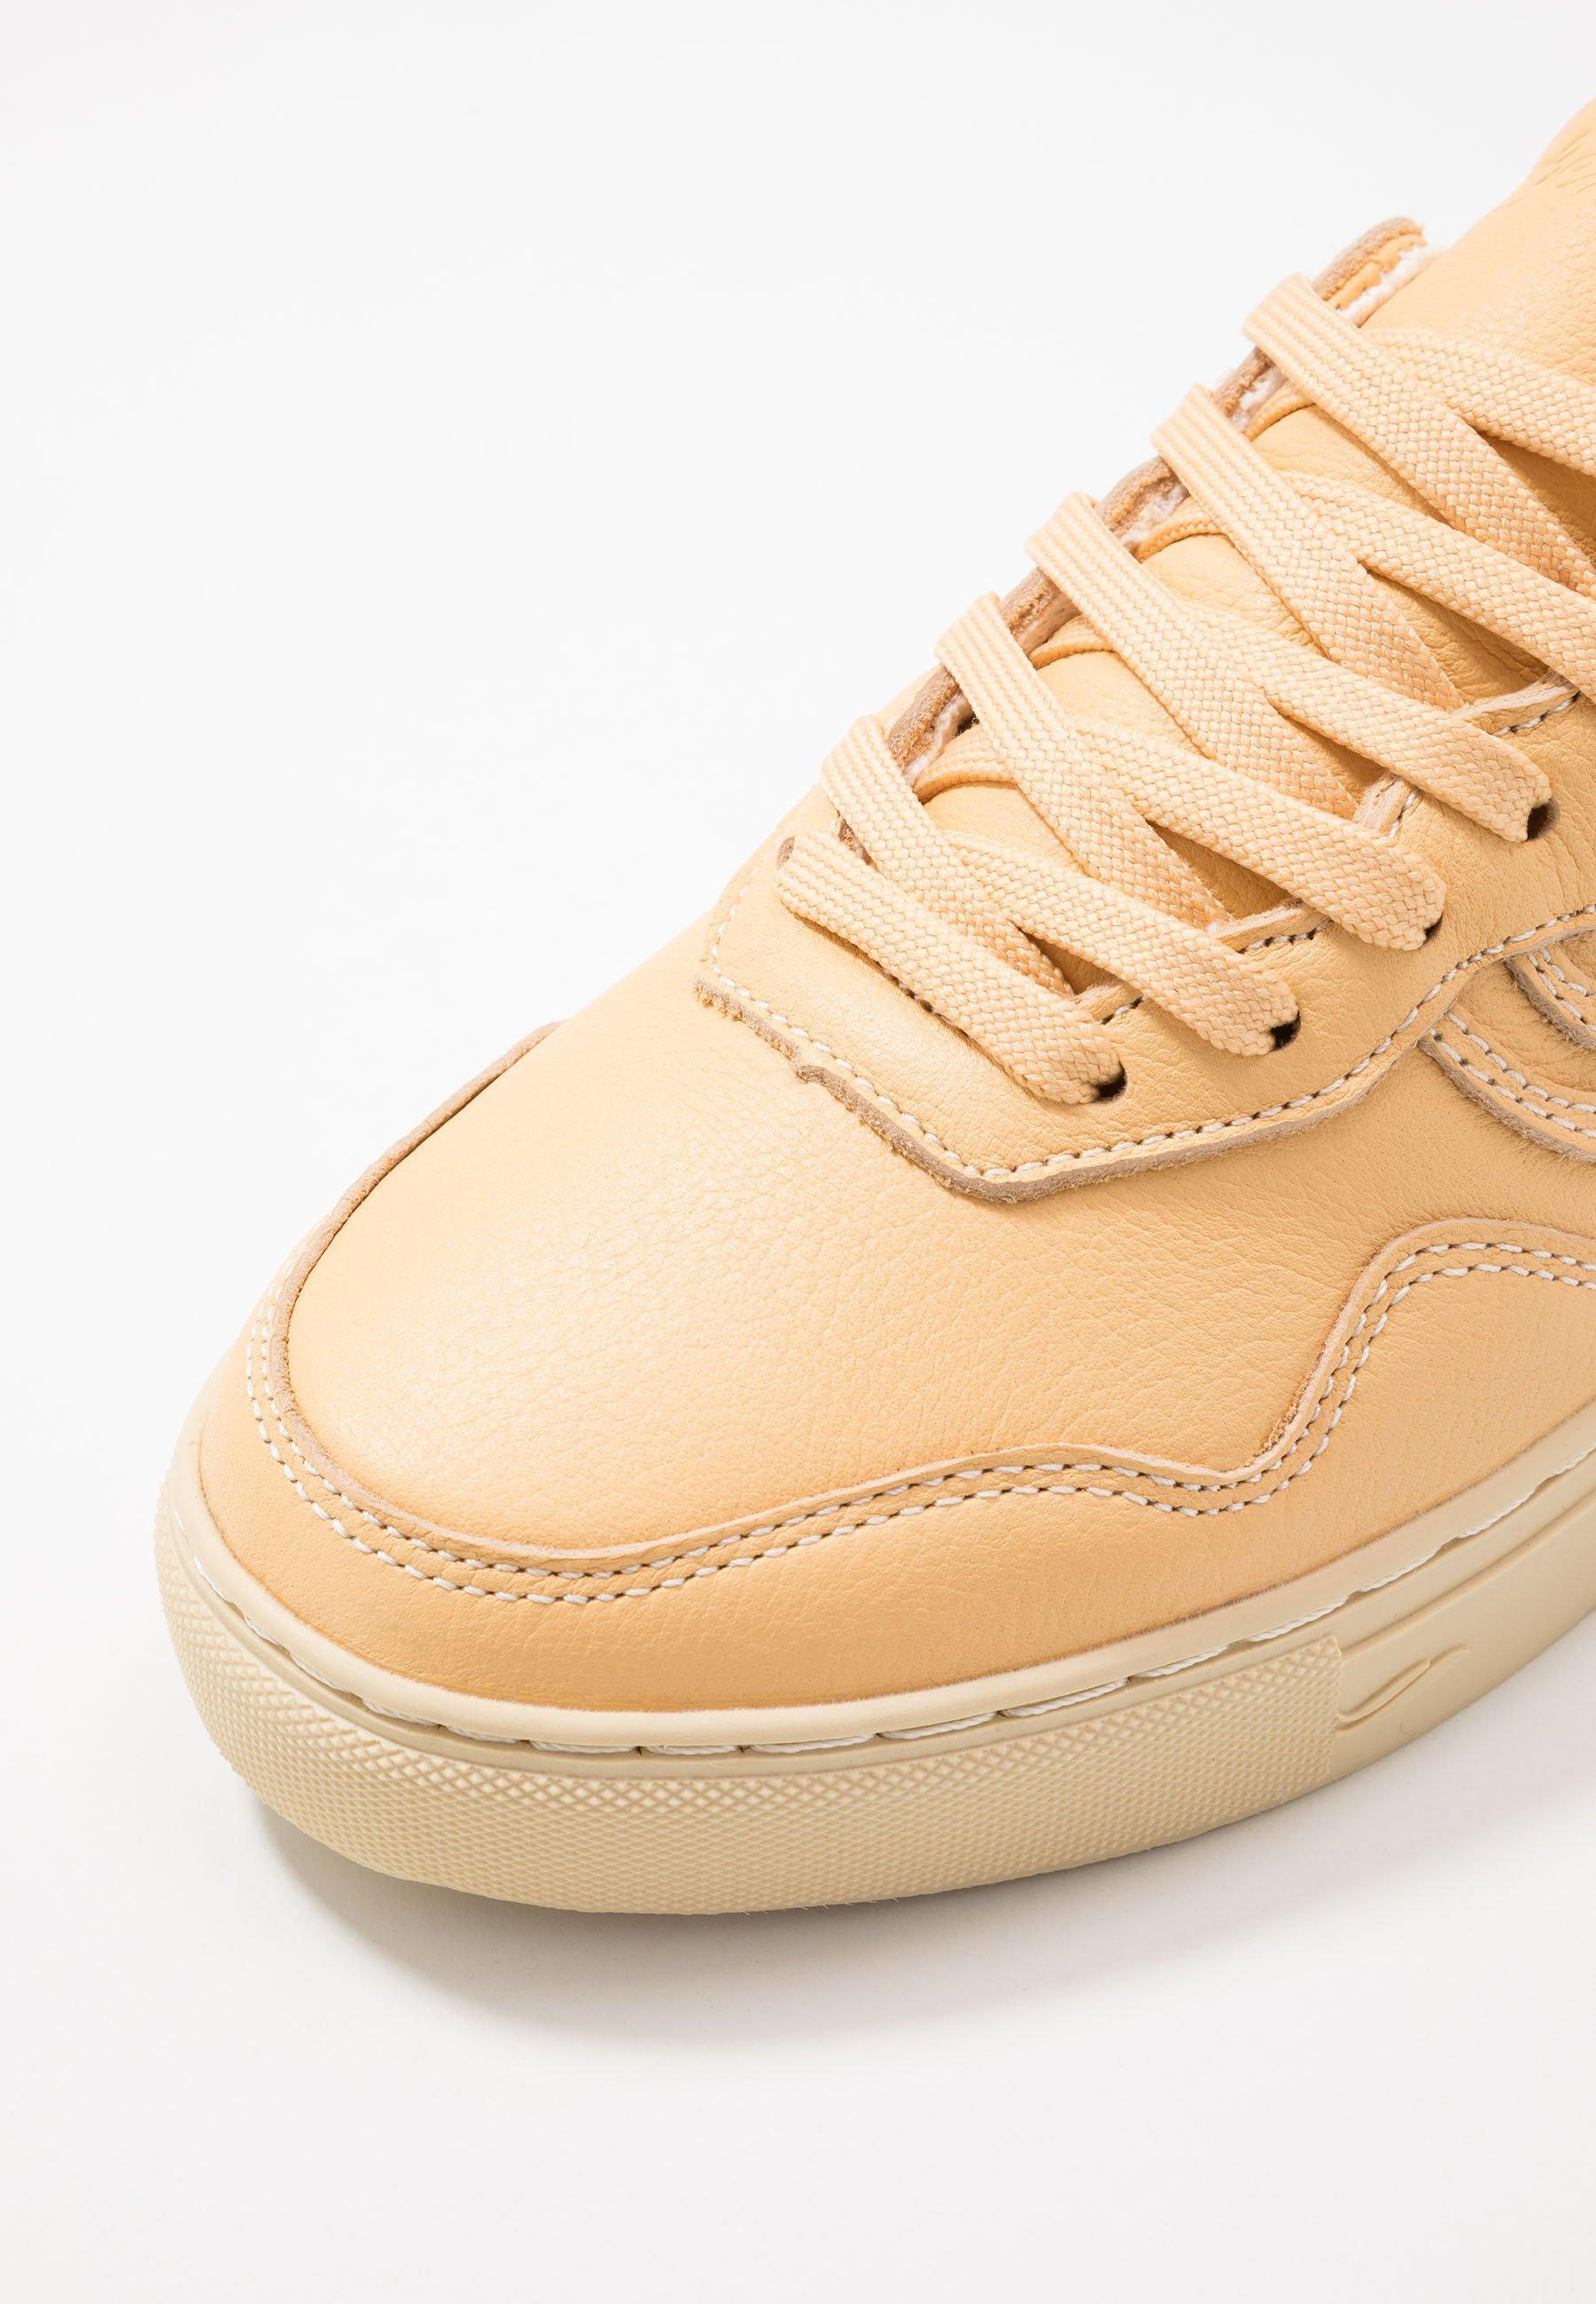 Genesis Soley Tumbled - Baskets Basses Wheat